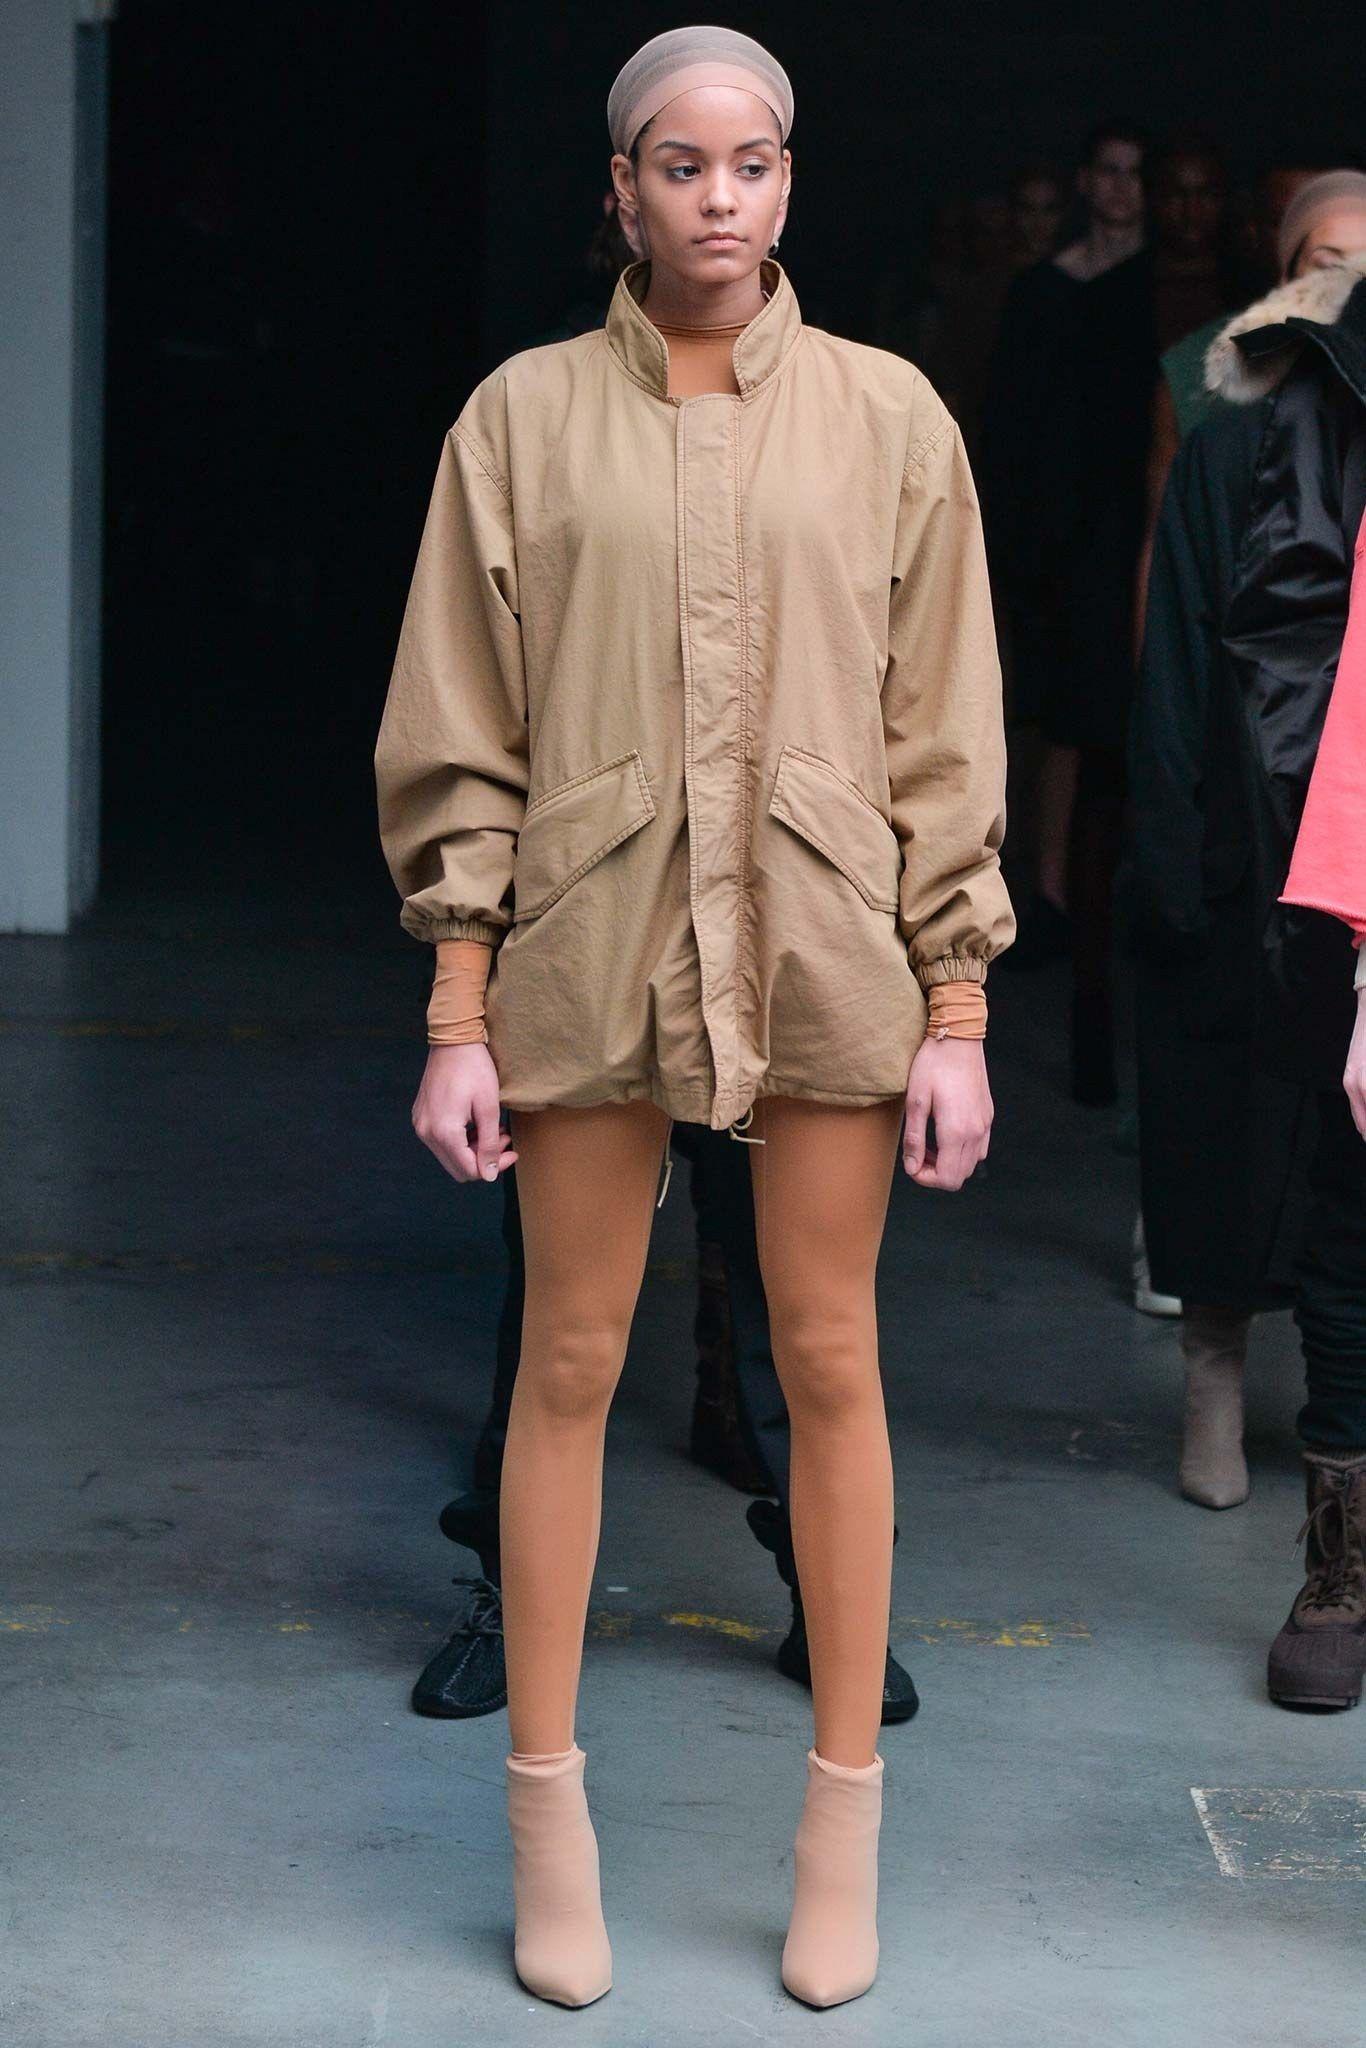 Yeezy Fall 2015 Ready To Wear Fashion Show Vogue Yeezy Fashion Kanye West Adidas Fashion